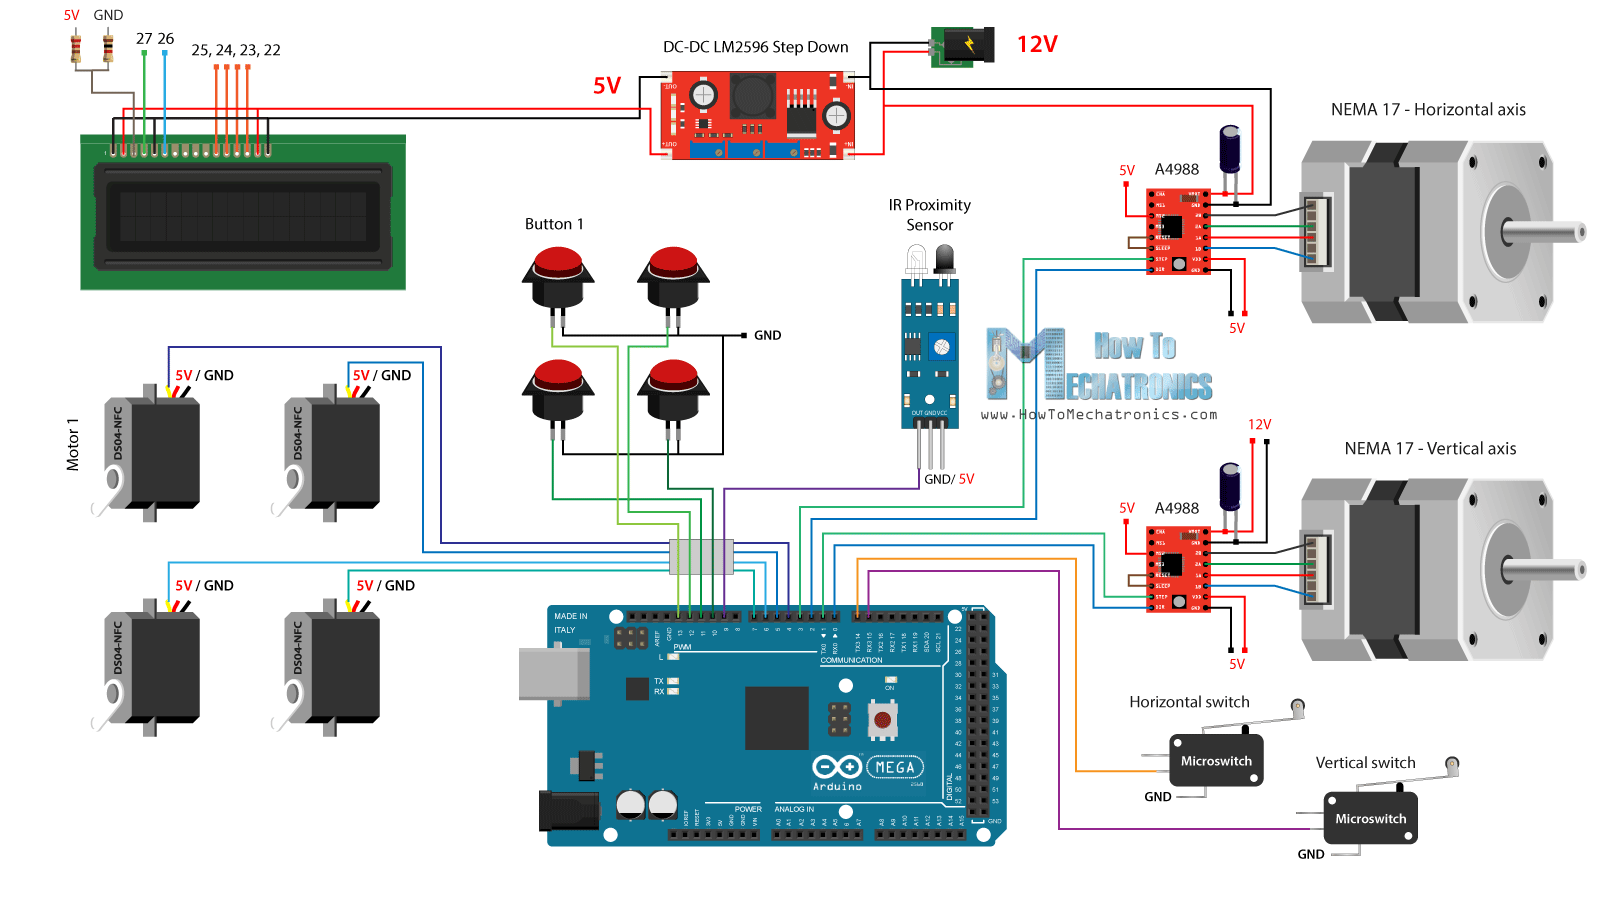 Ado Piso Wifi Wiring Diagram 2000 Ford F250 Headlight Diy Vending Machine Arduino Based Mechatronics Project